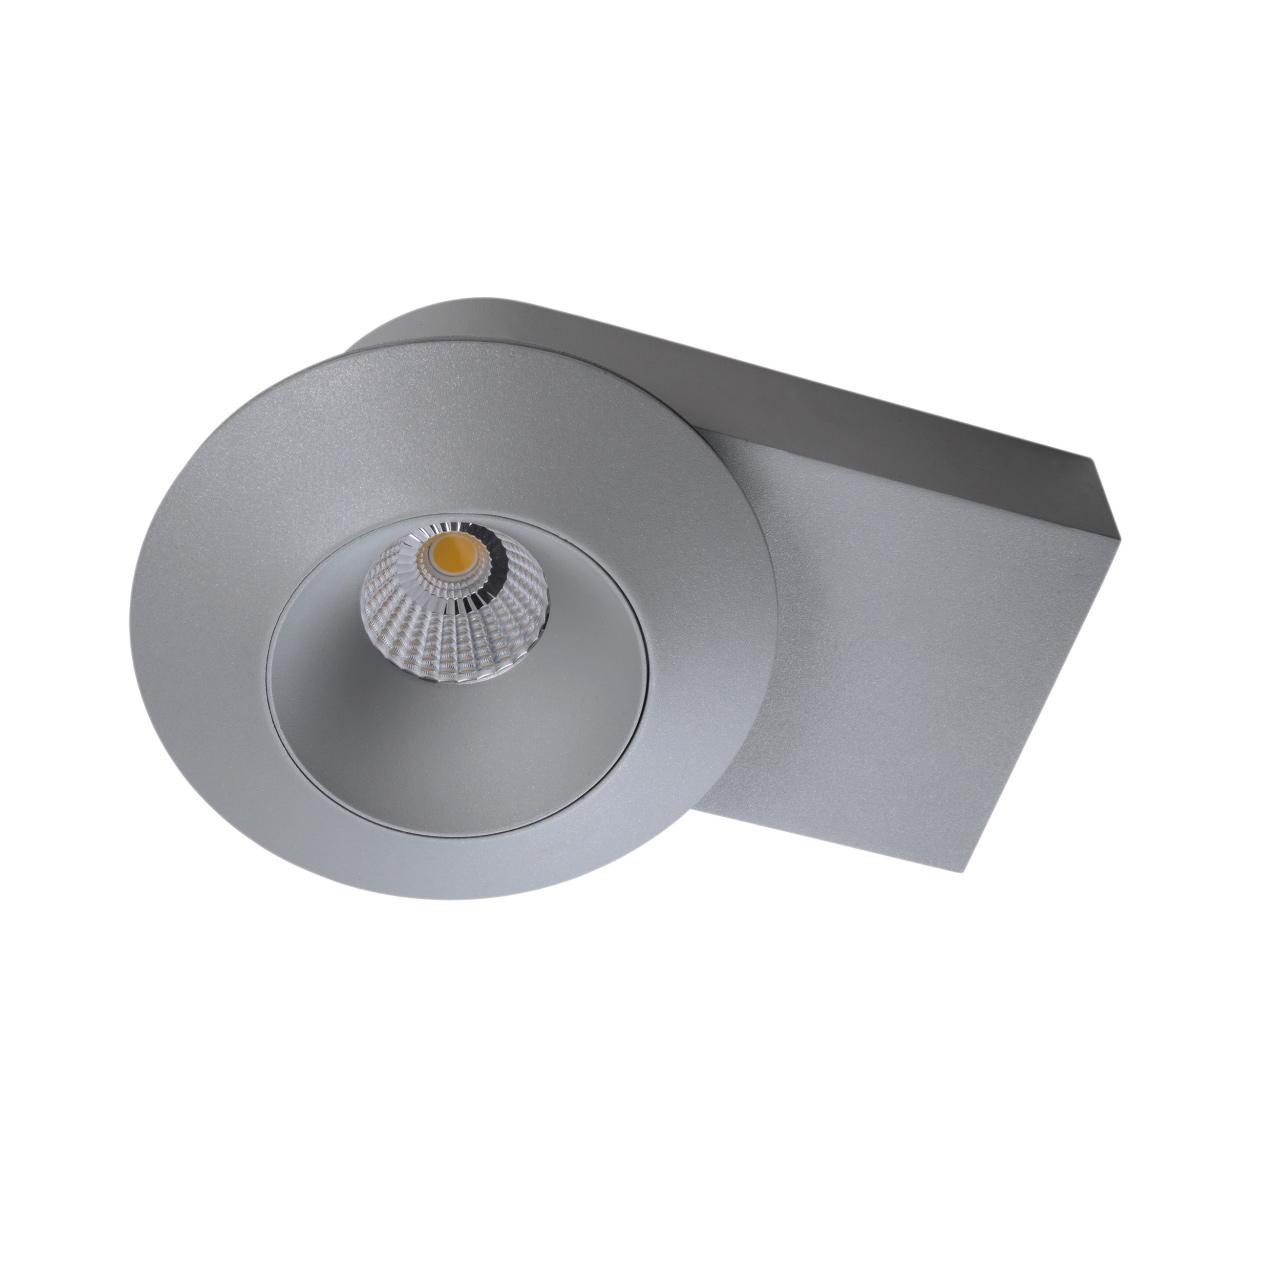 Светильник Orbe LED 15W 1240LM 60G серый 3000K Lightstar 051319